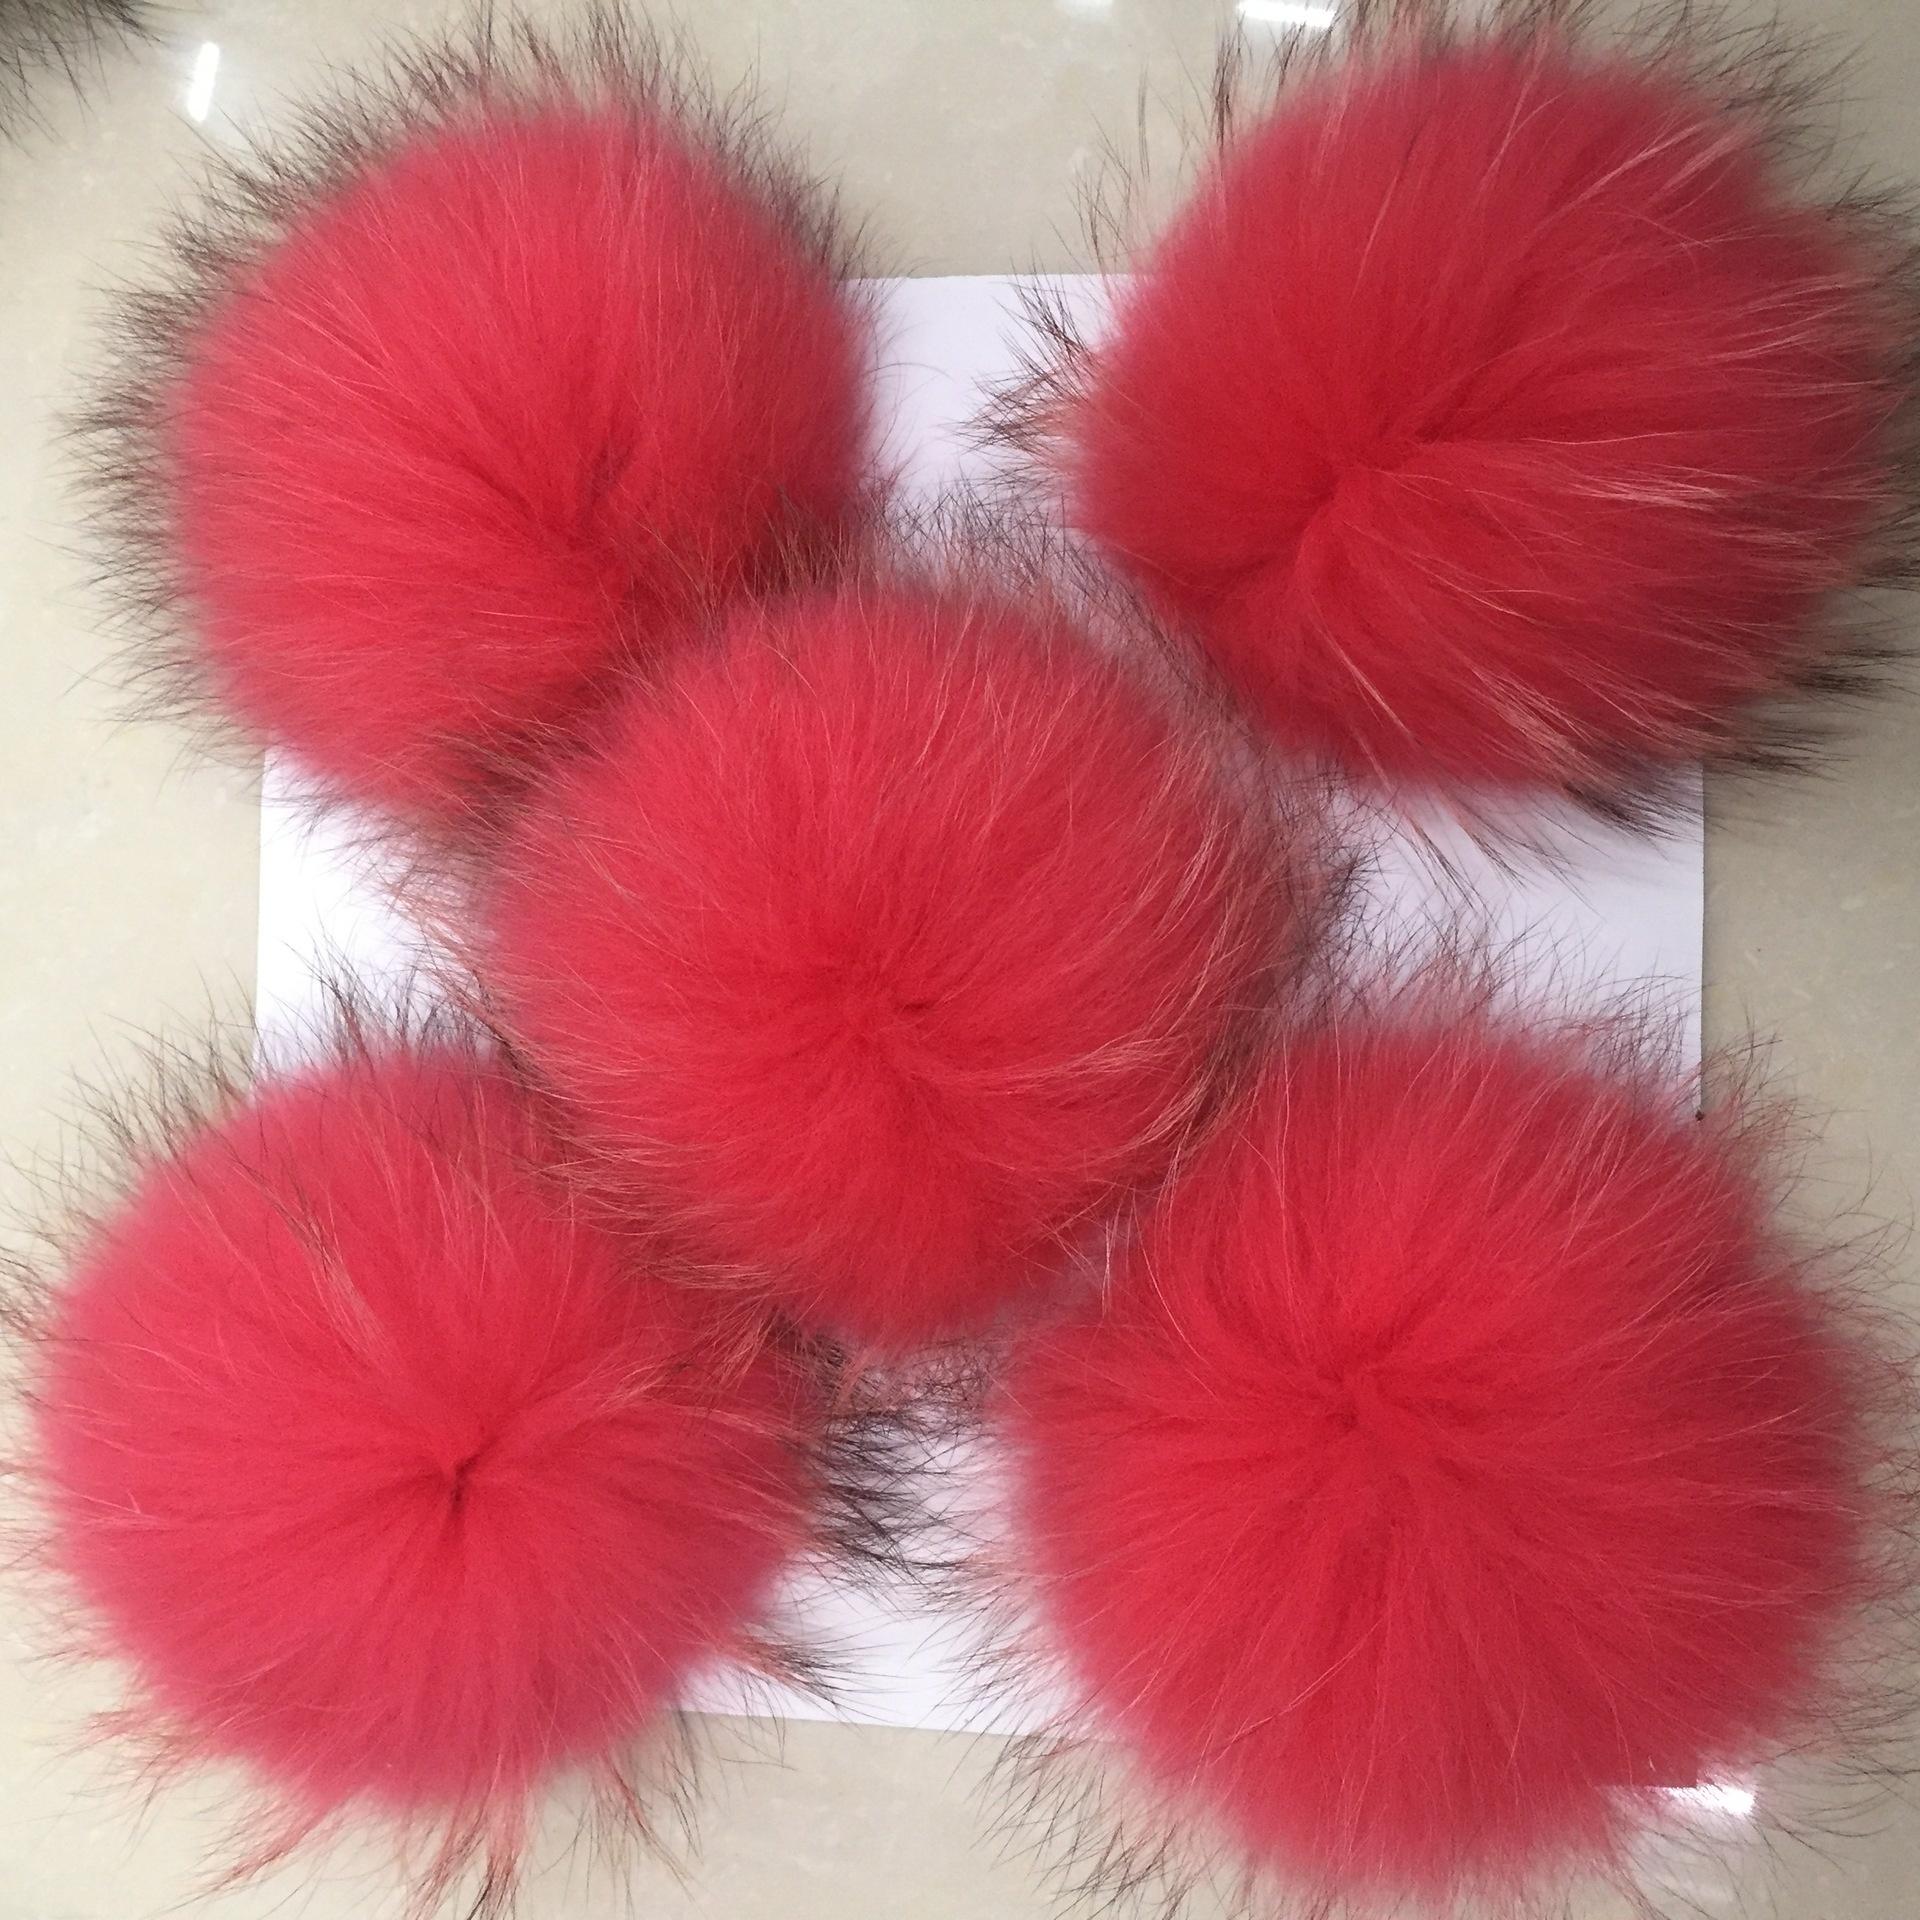 Big Size 15cm DIY Real Fox Fur Pompoms Raccoon Fur Pom Poms Balls Natural Fur Pompon For Hats Bags Shoes Scarves Accessories